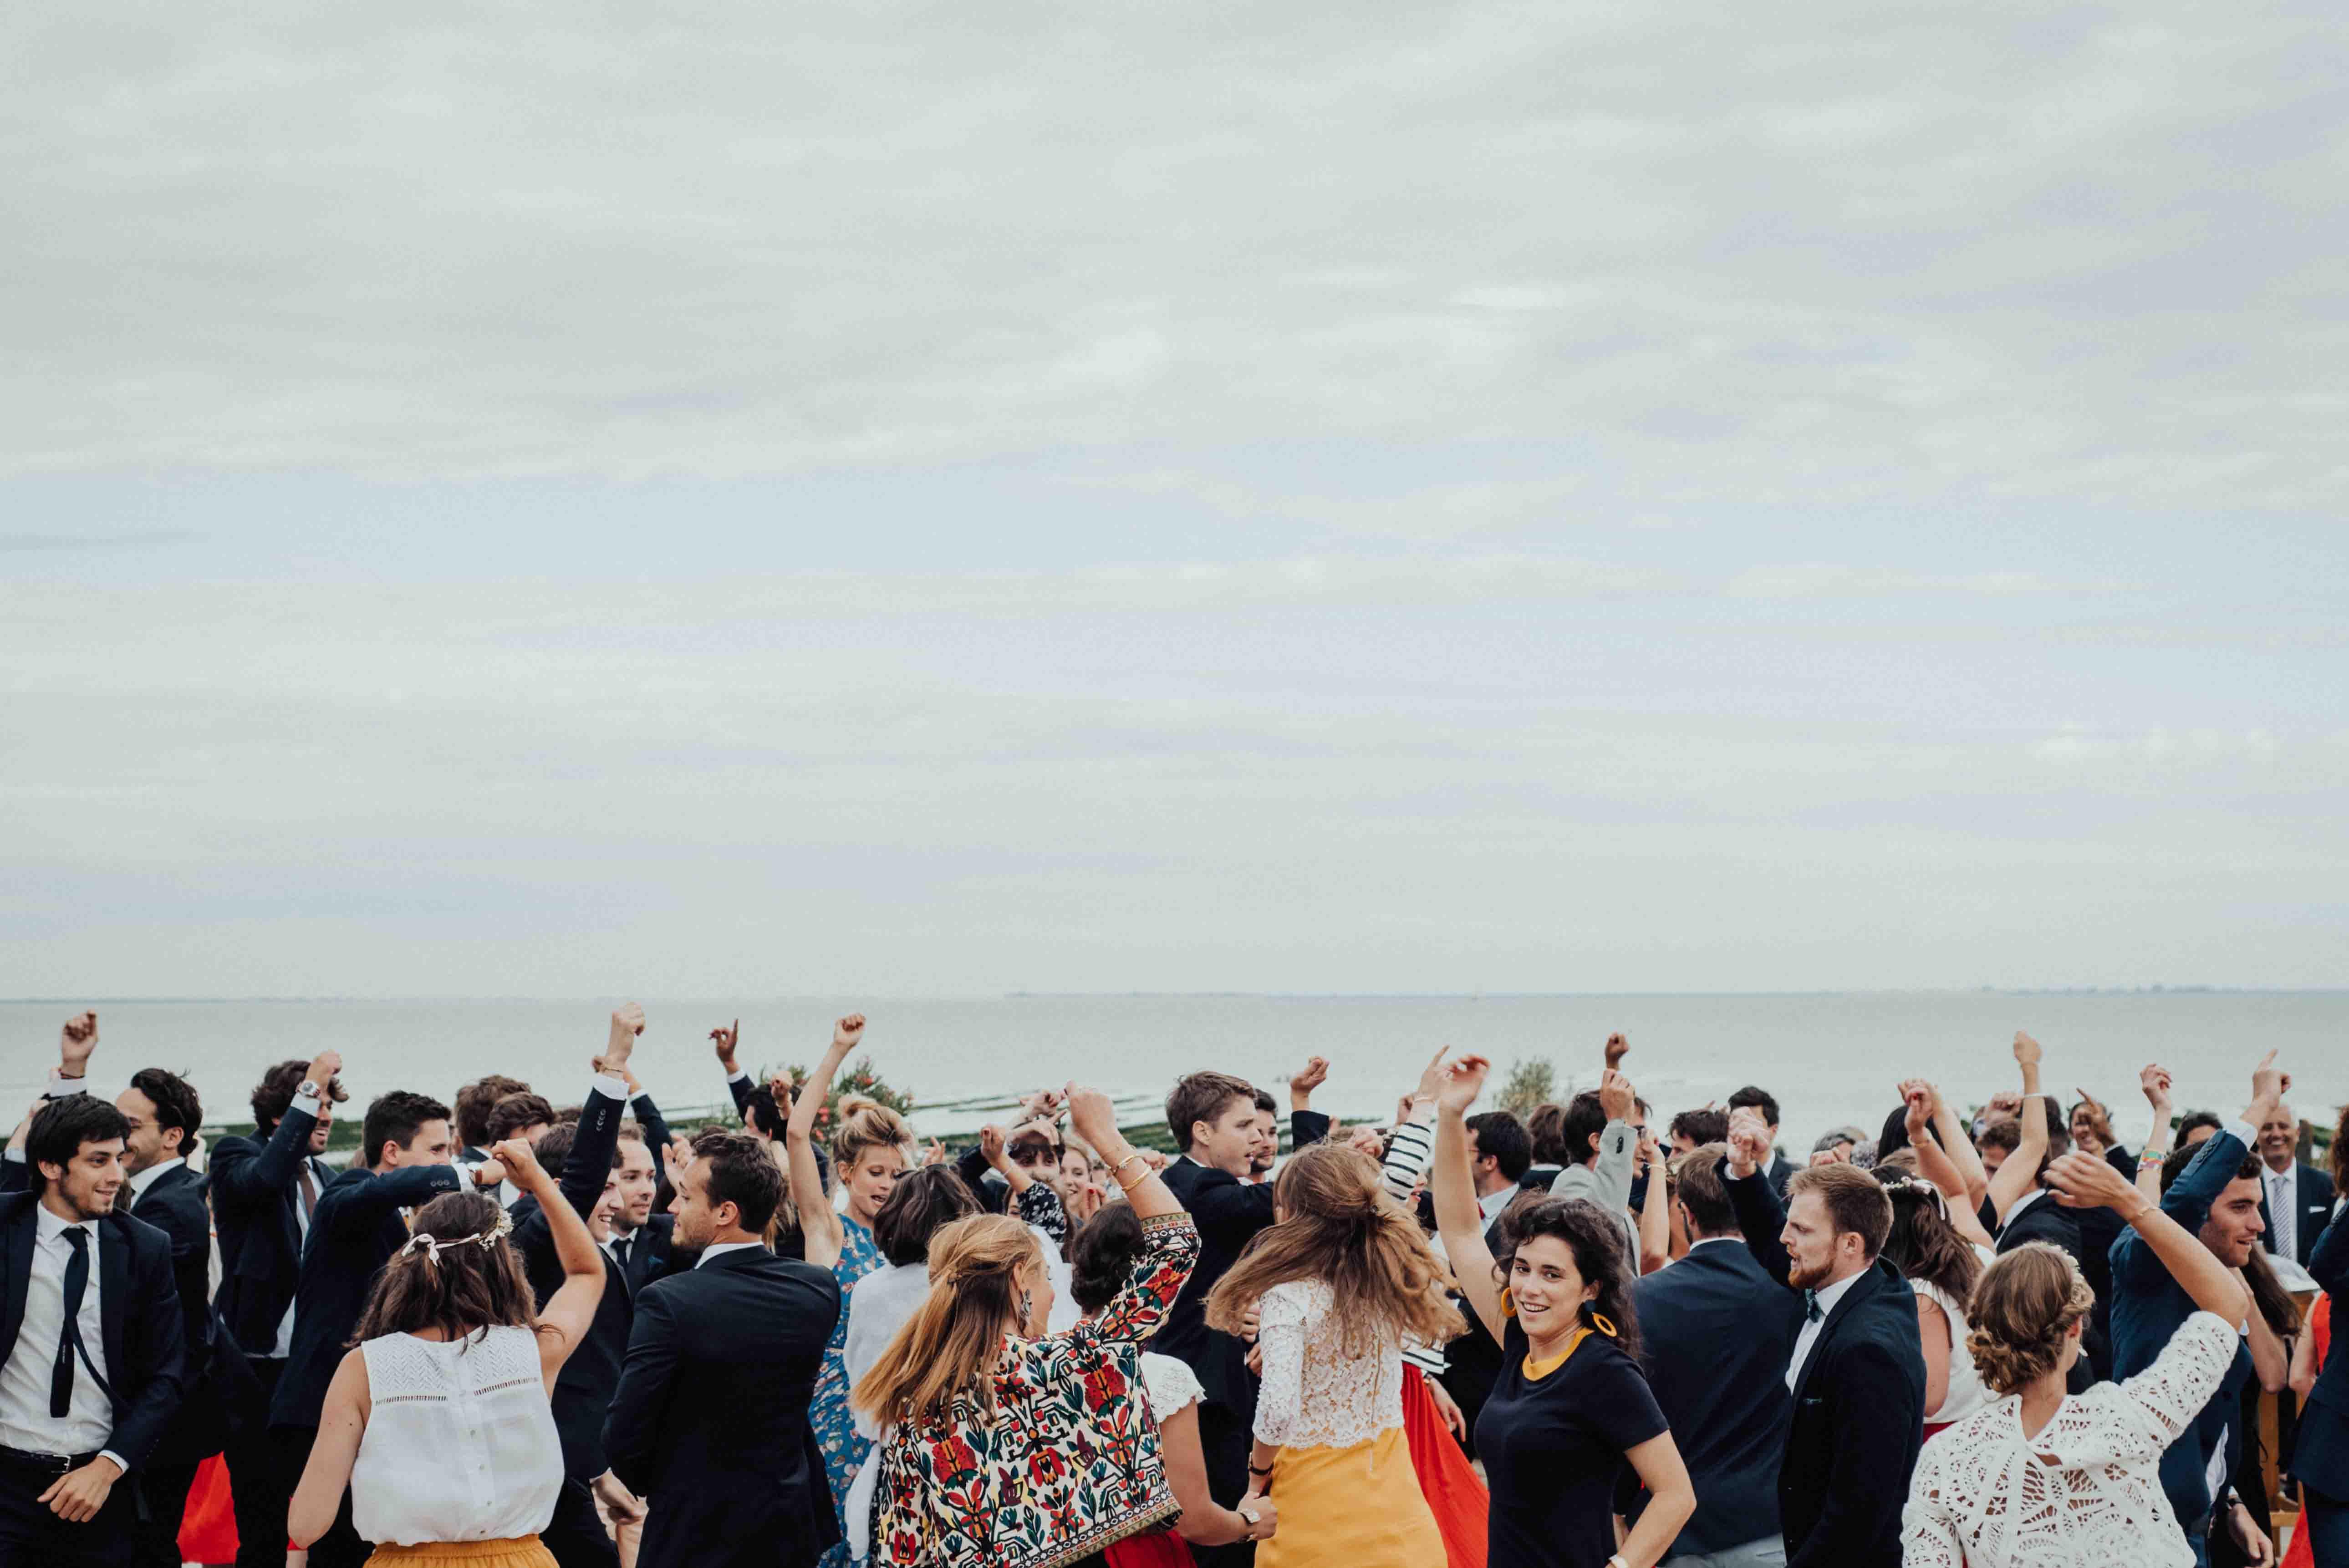 lieu mariage insolite ile de re wedding planner